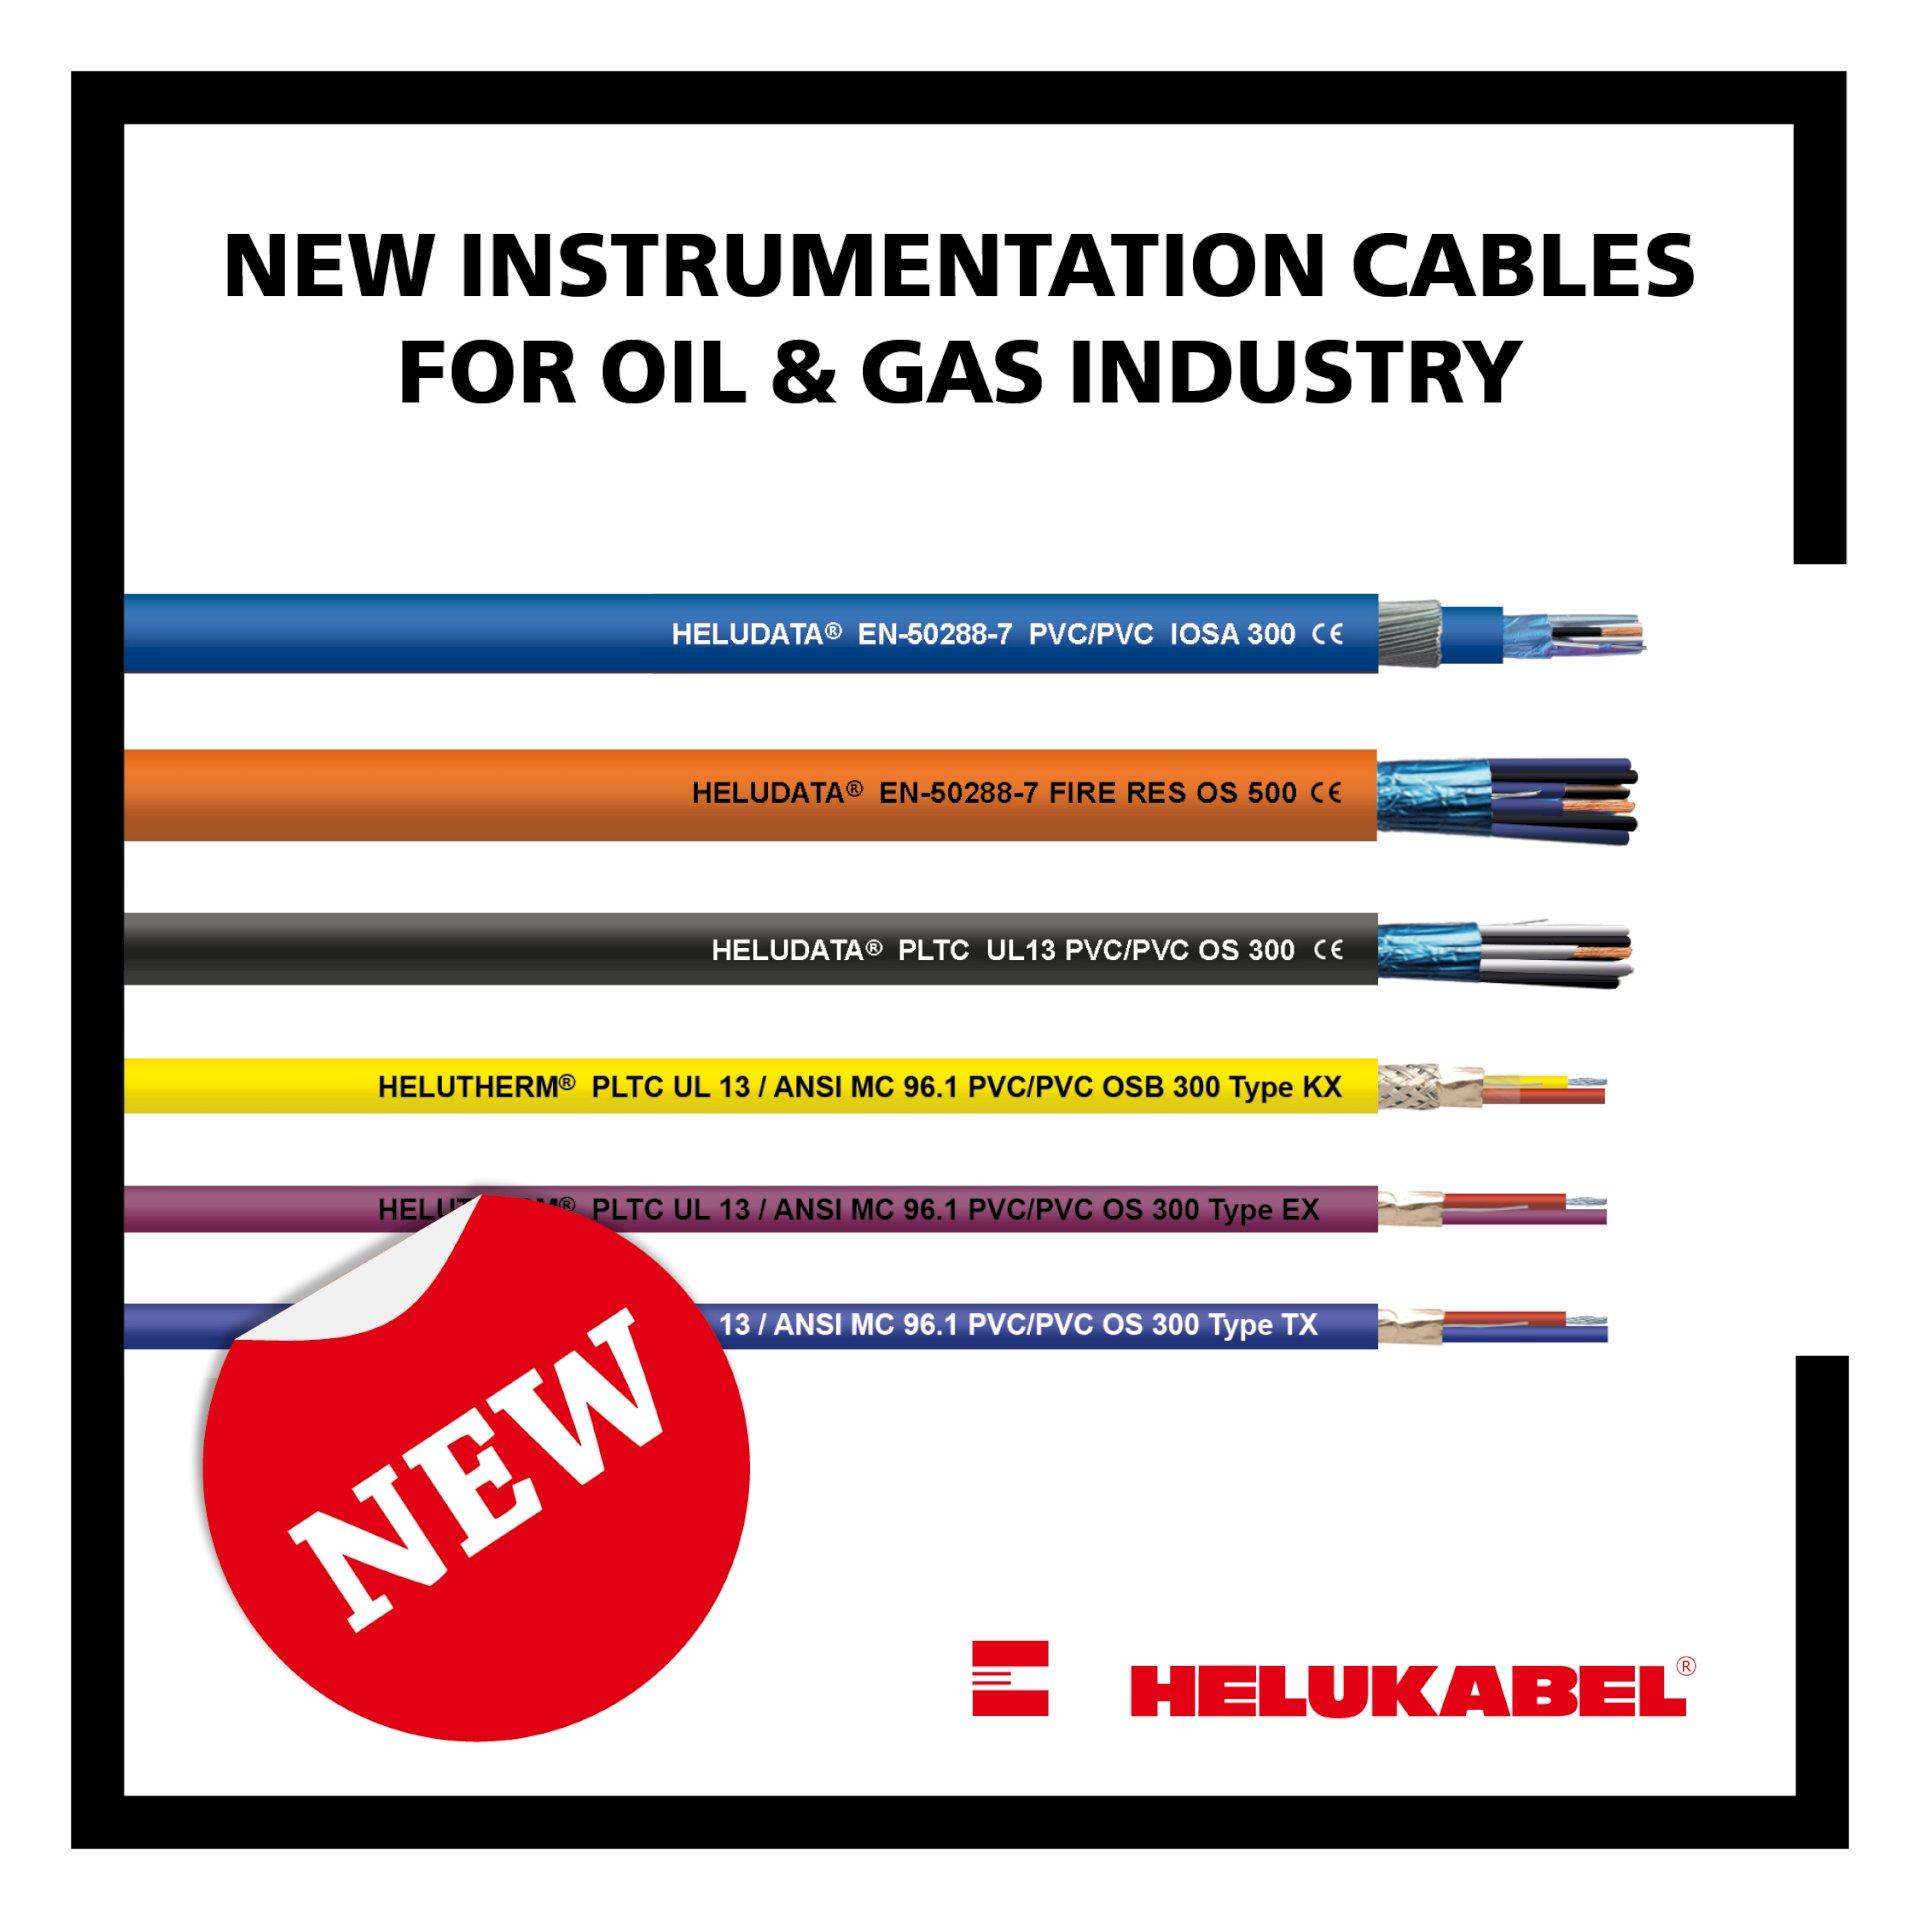 Nieuwe kabels van Helukabel